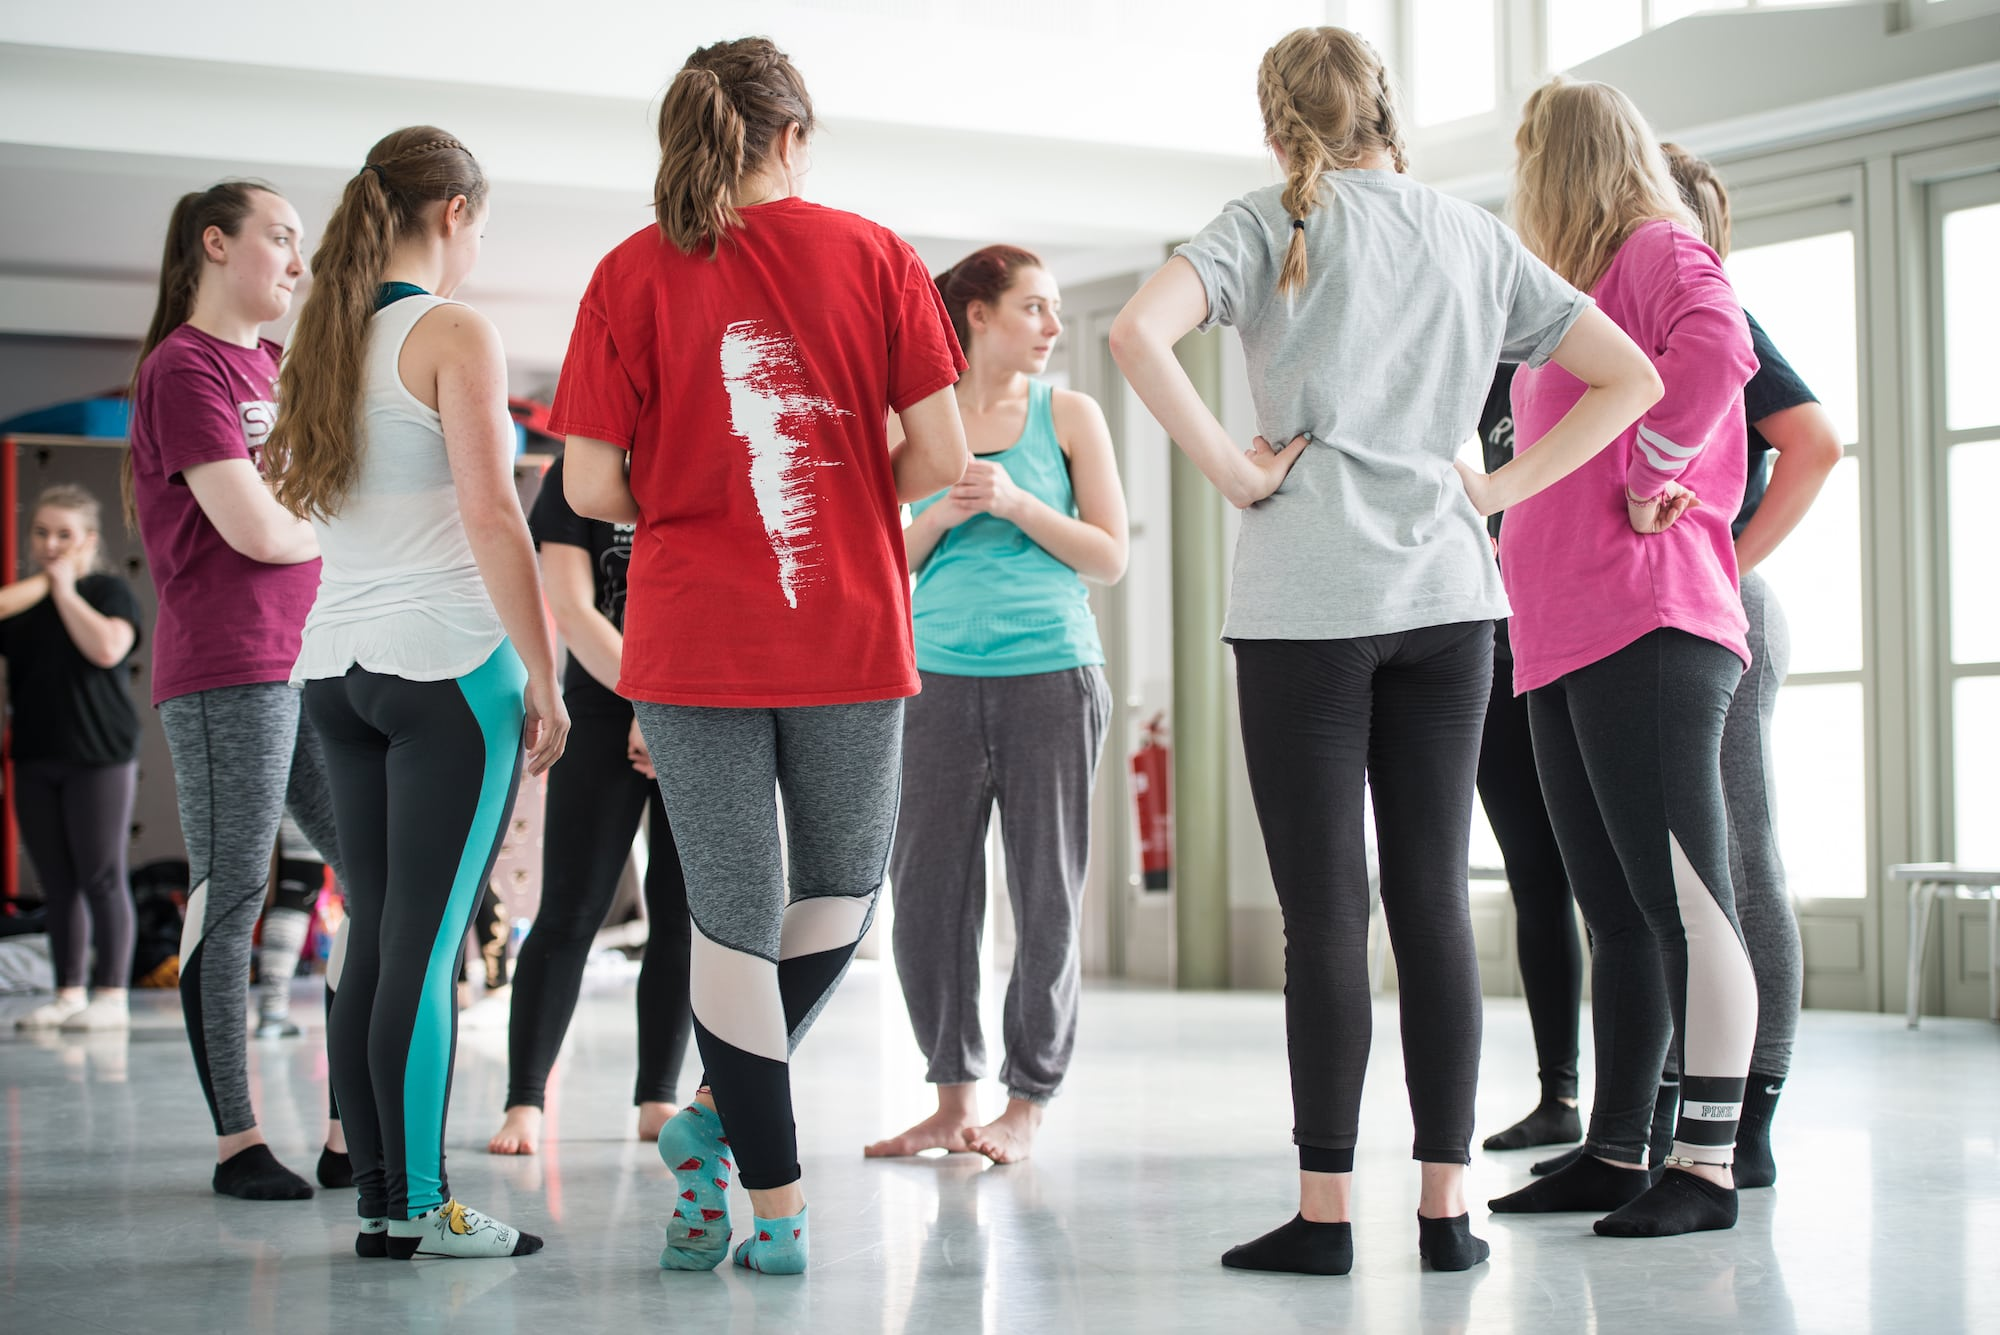 Students take part in Digital Dance workshop